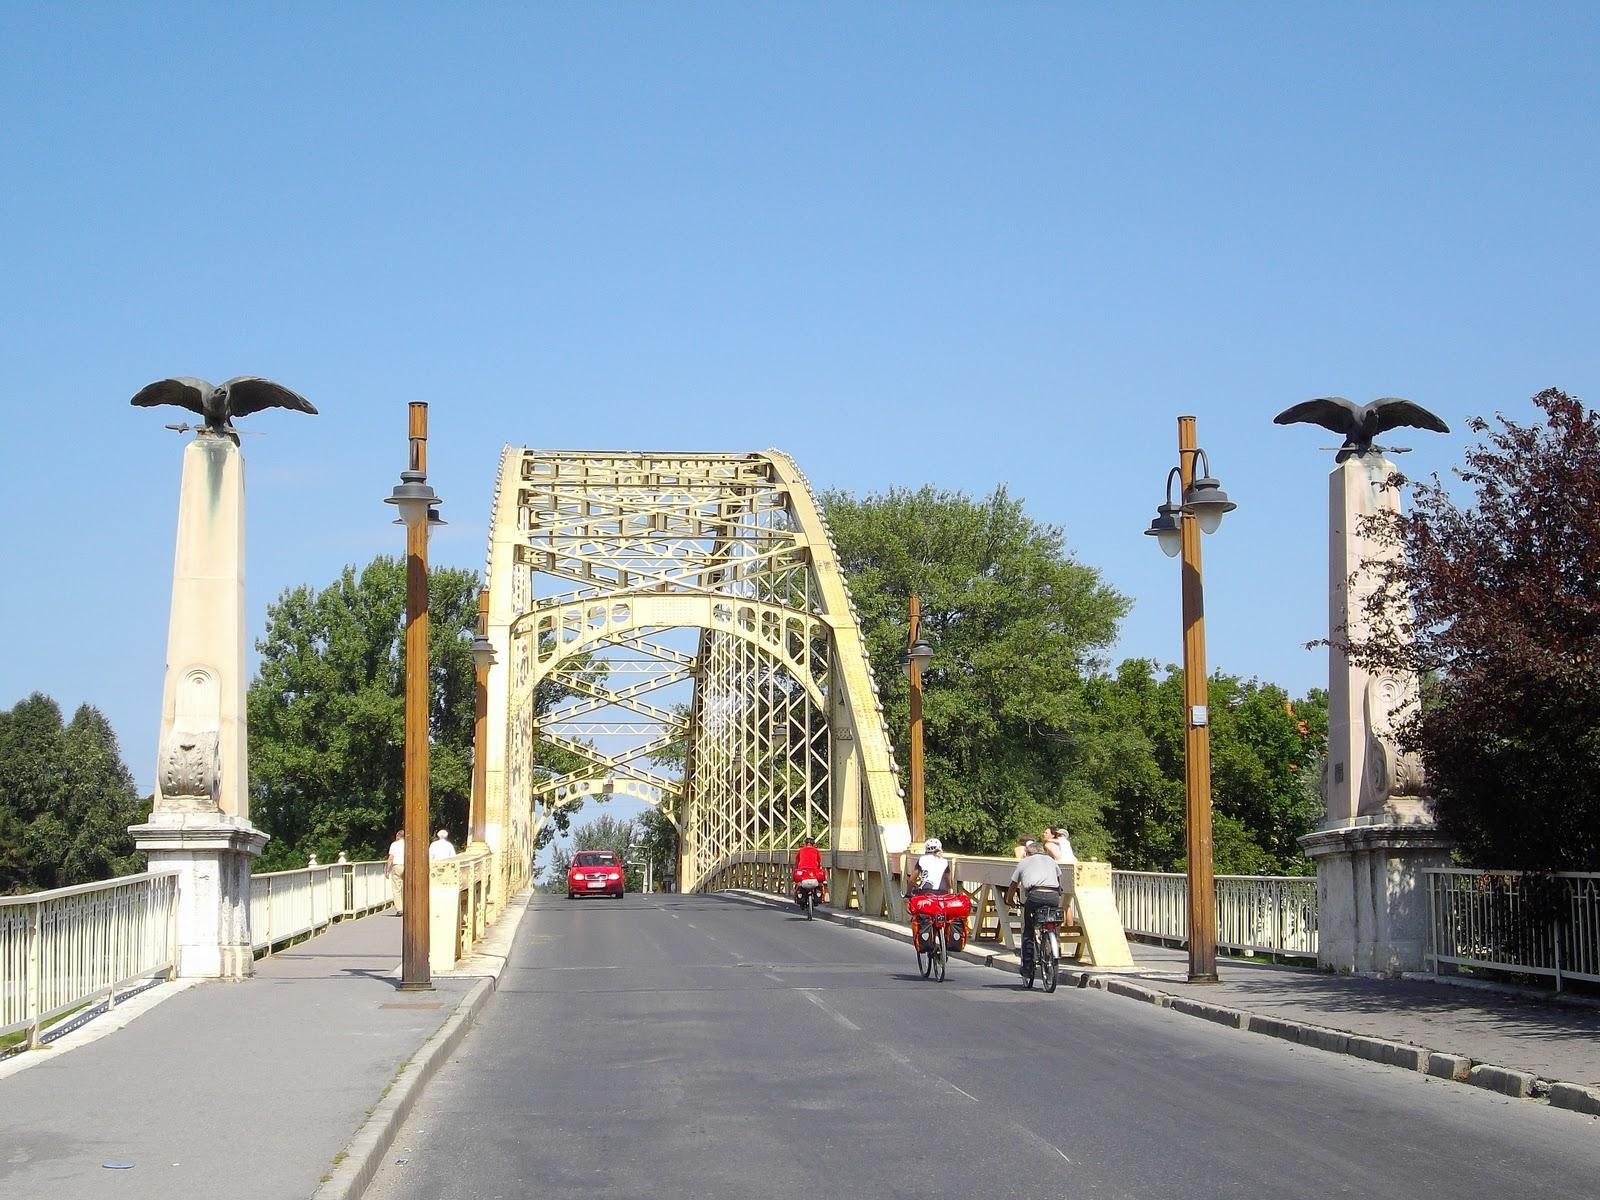 Gyor Hungary  City pictures : Gyor Hungary Image